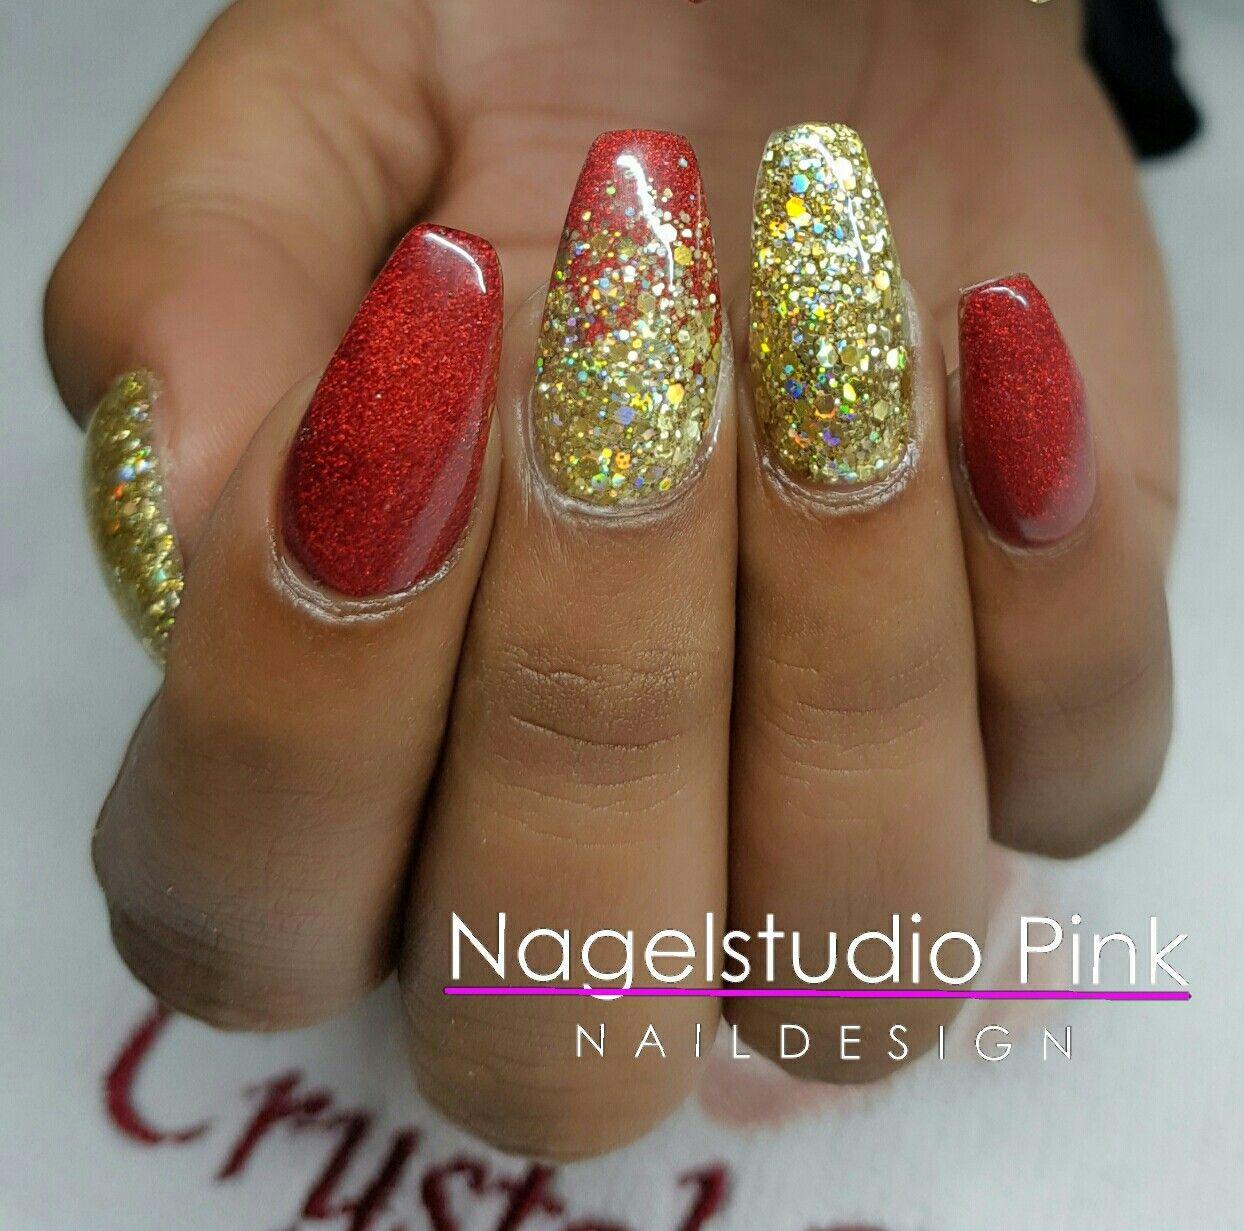 Jingle Bell Feeling!  #crystalnails #veralangeslag #nagelstudiopink #arnhem #crystalac #nailart #nails #salonnailart #glitterheaven #urbannails #christmas